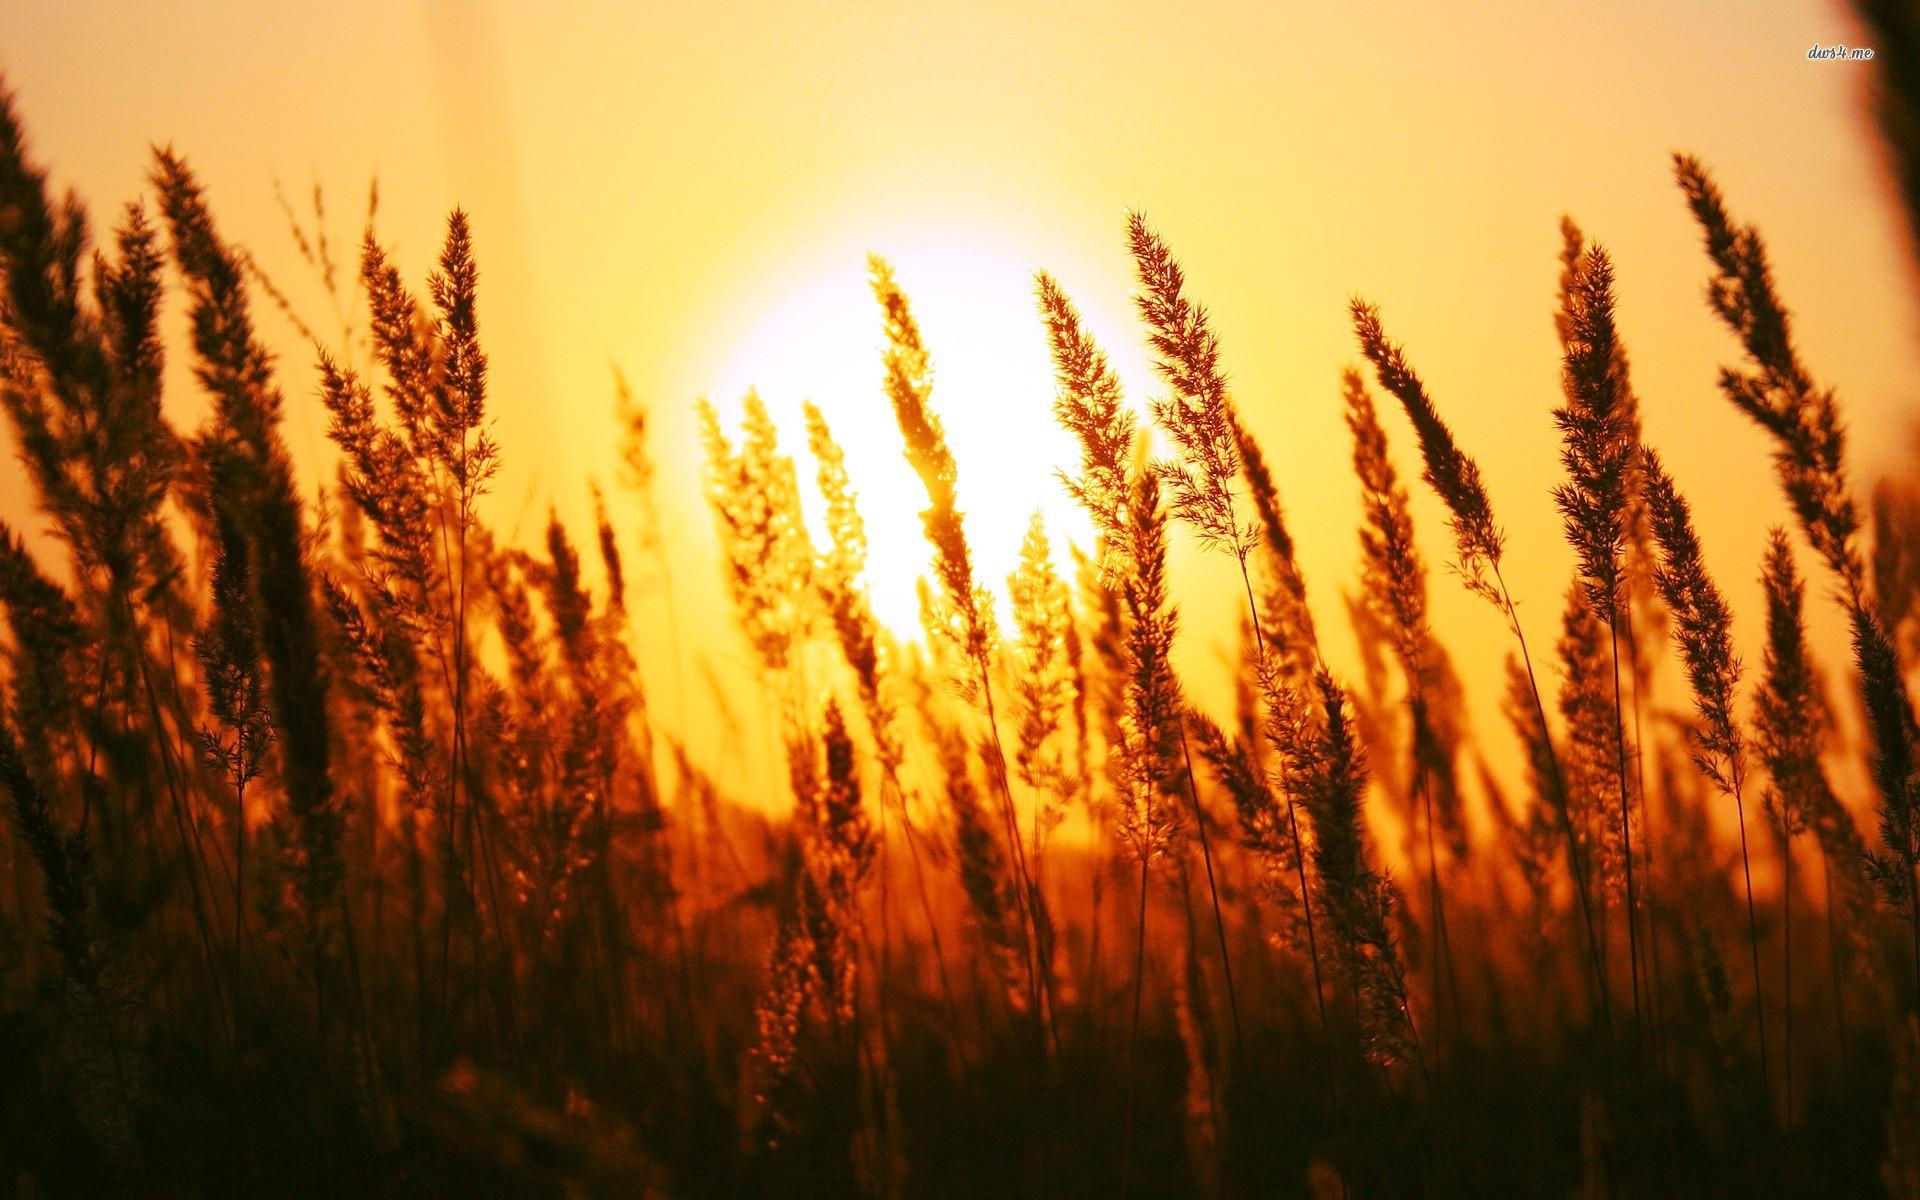 Sunset through grass photo